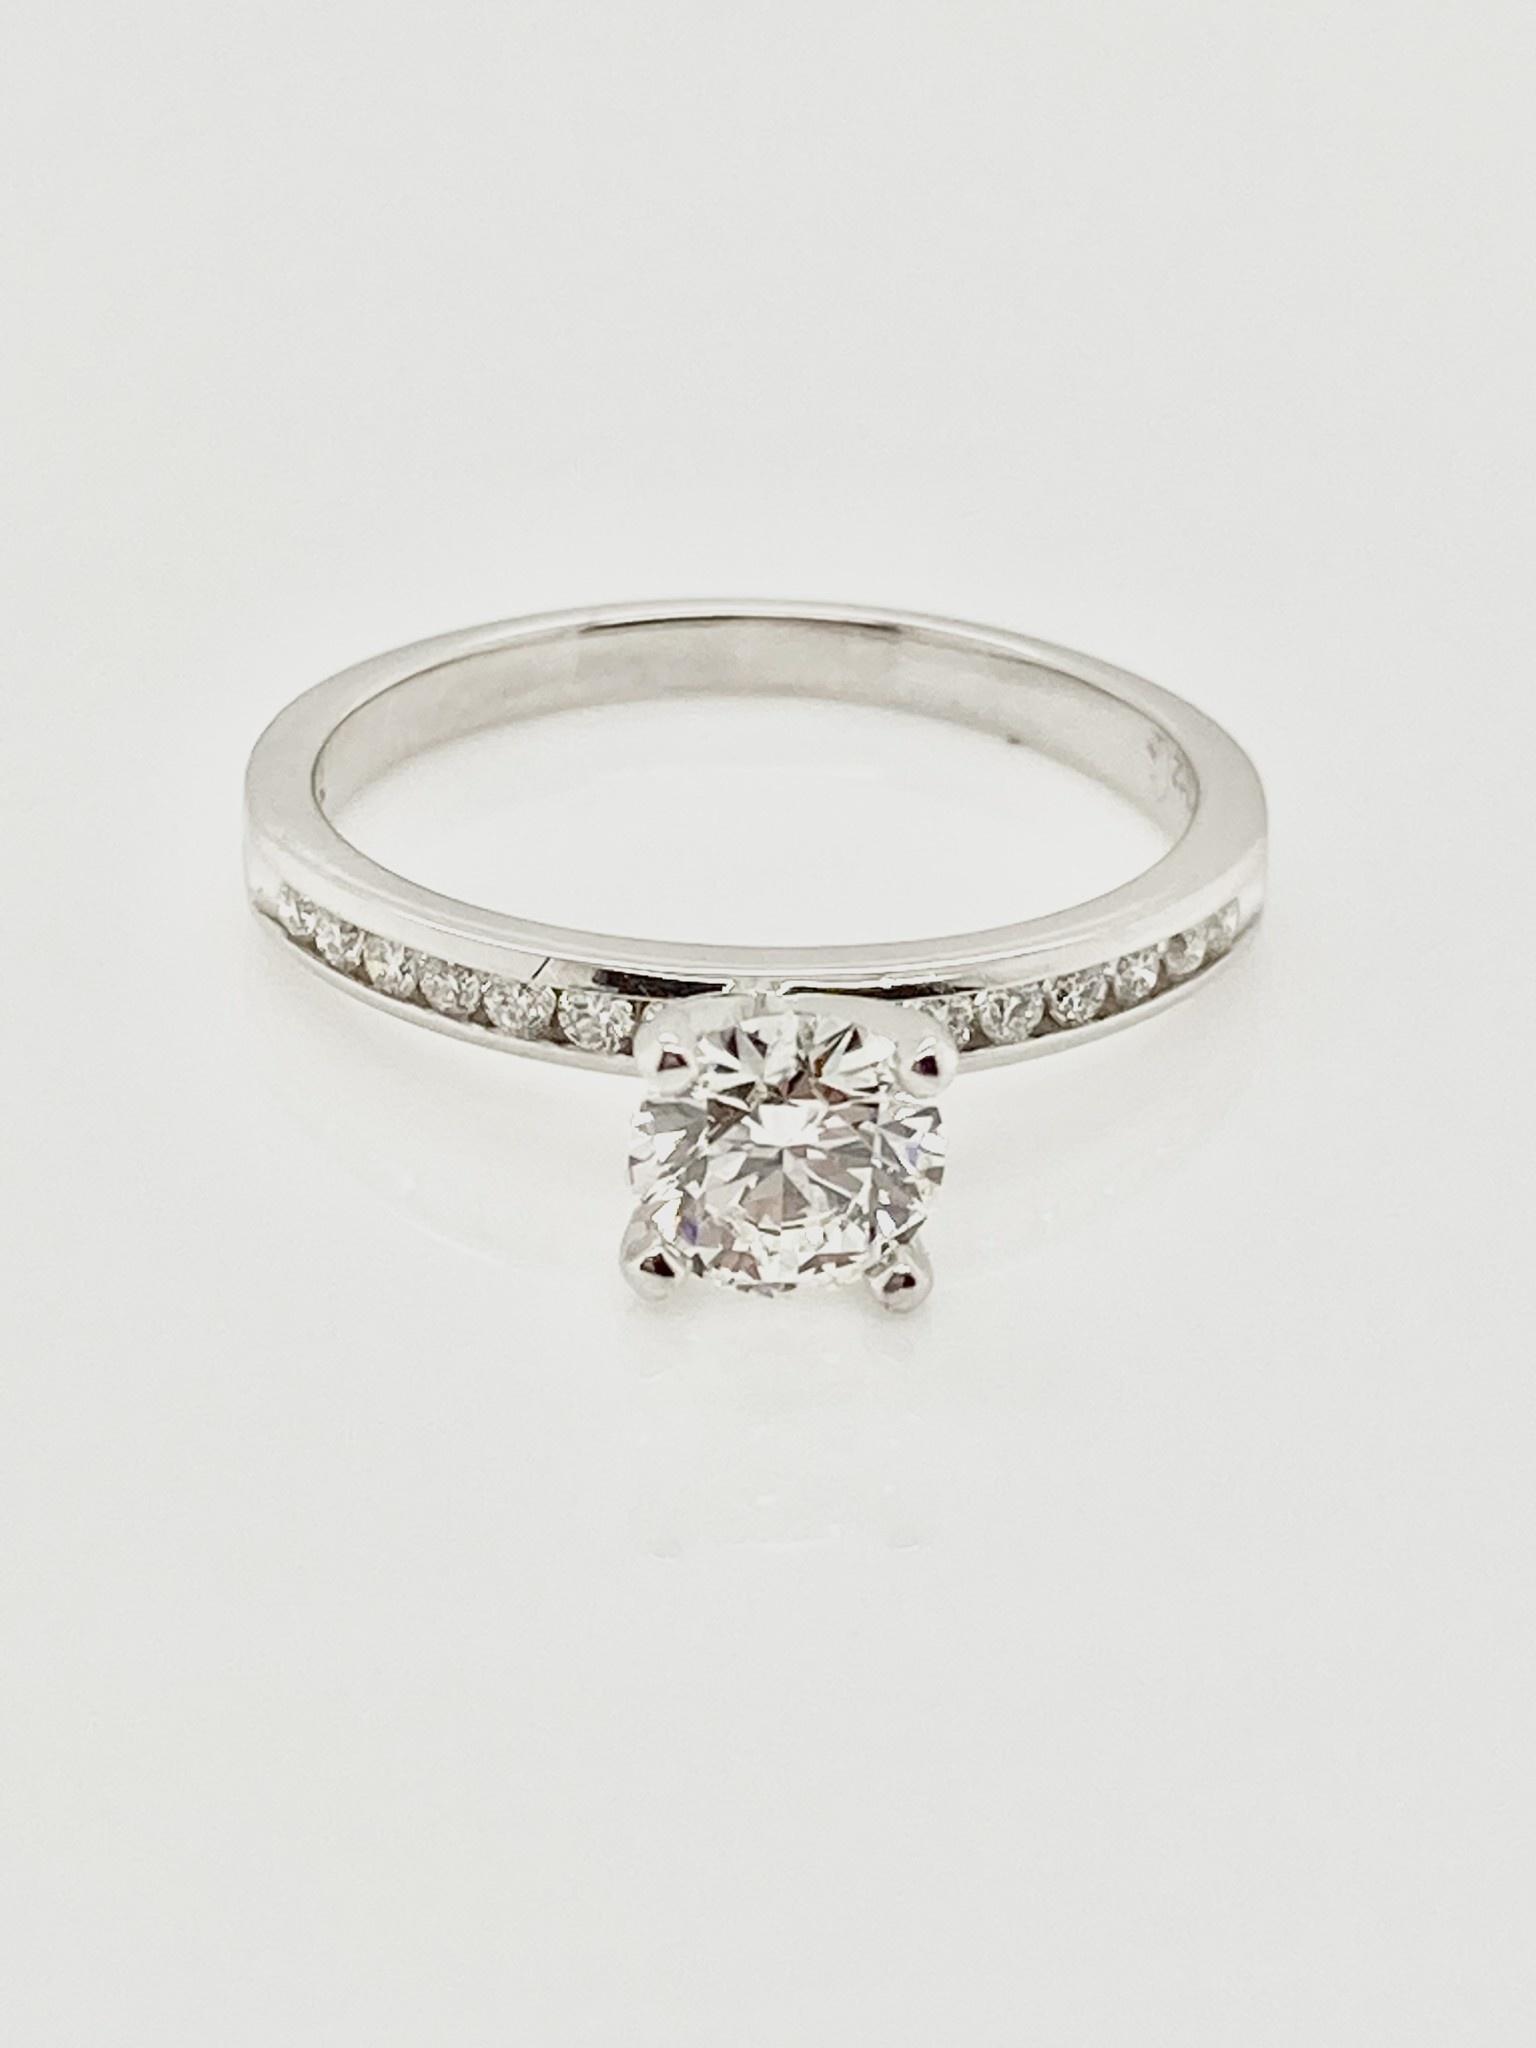 14White Gold Diamond Engagement Ring 0.54ct